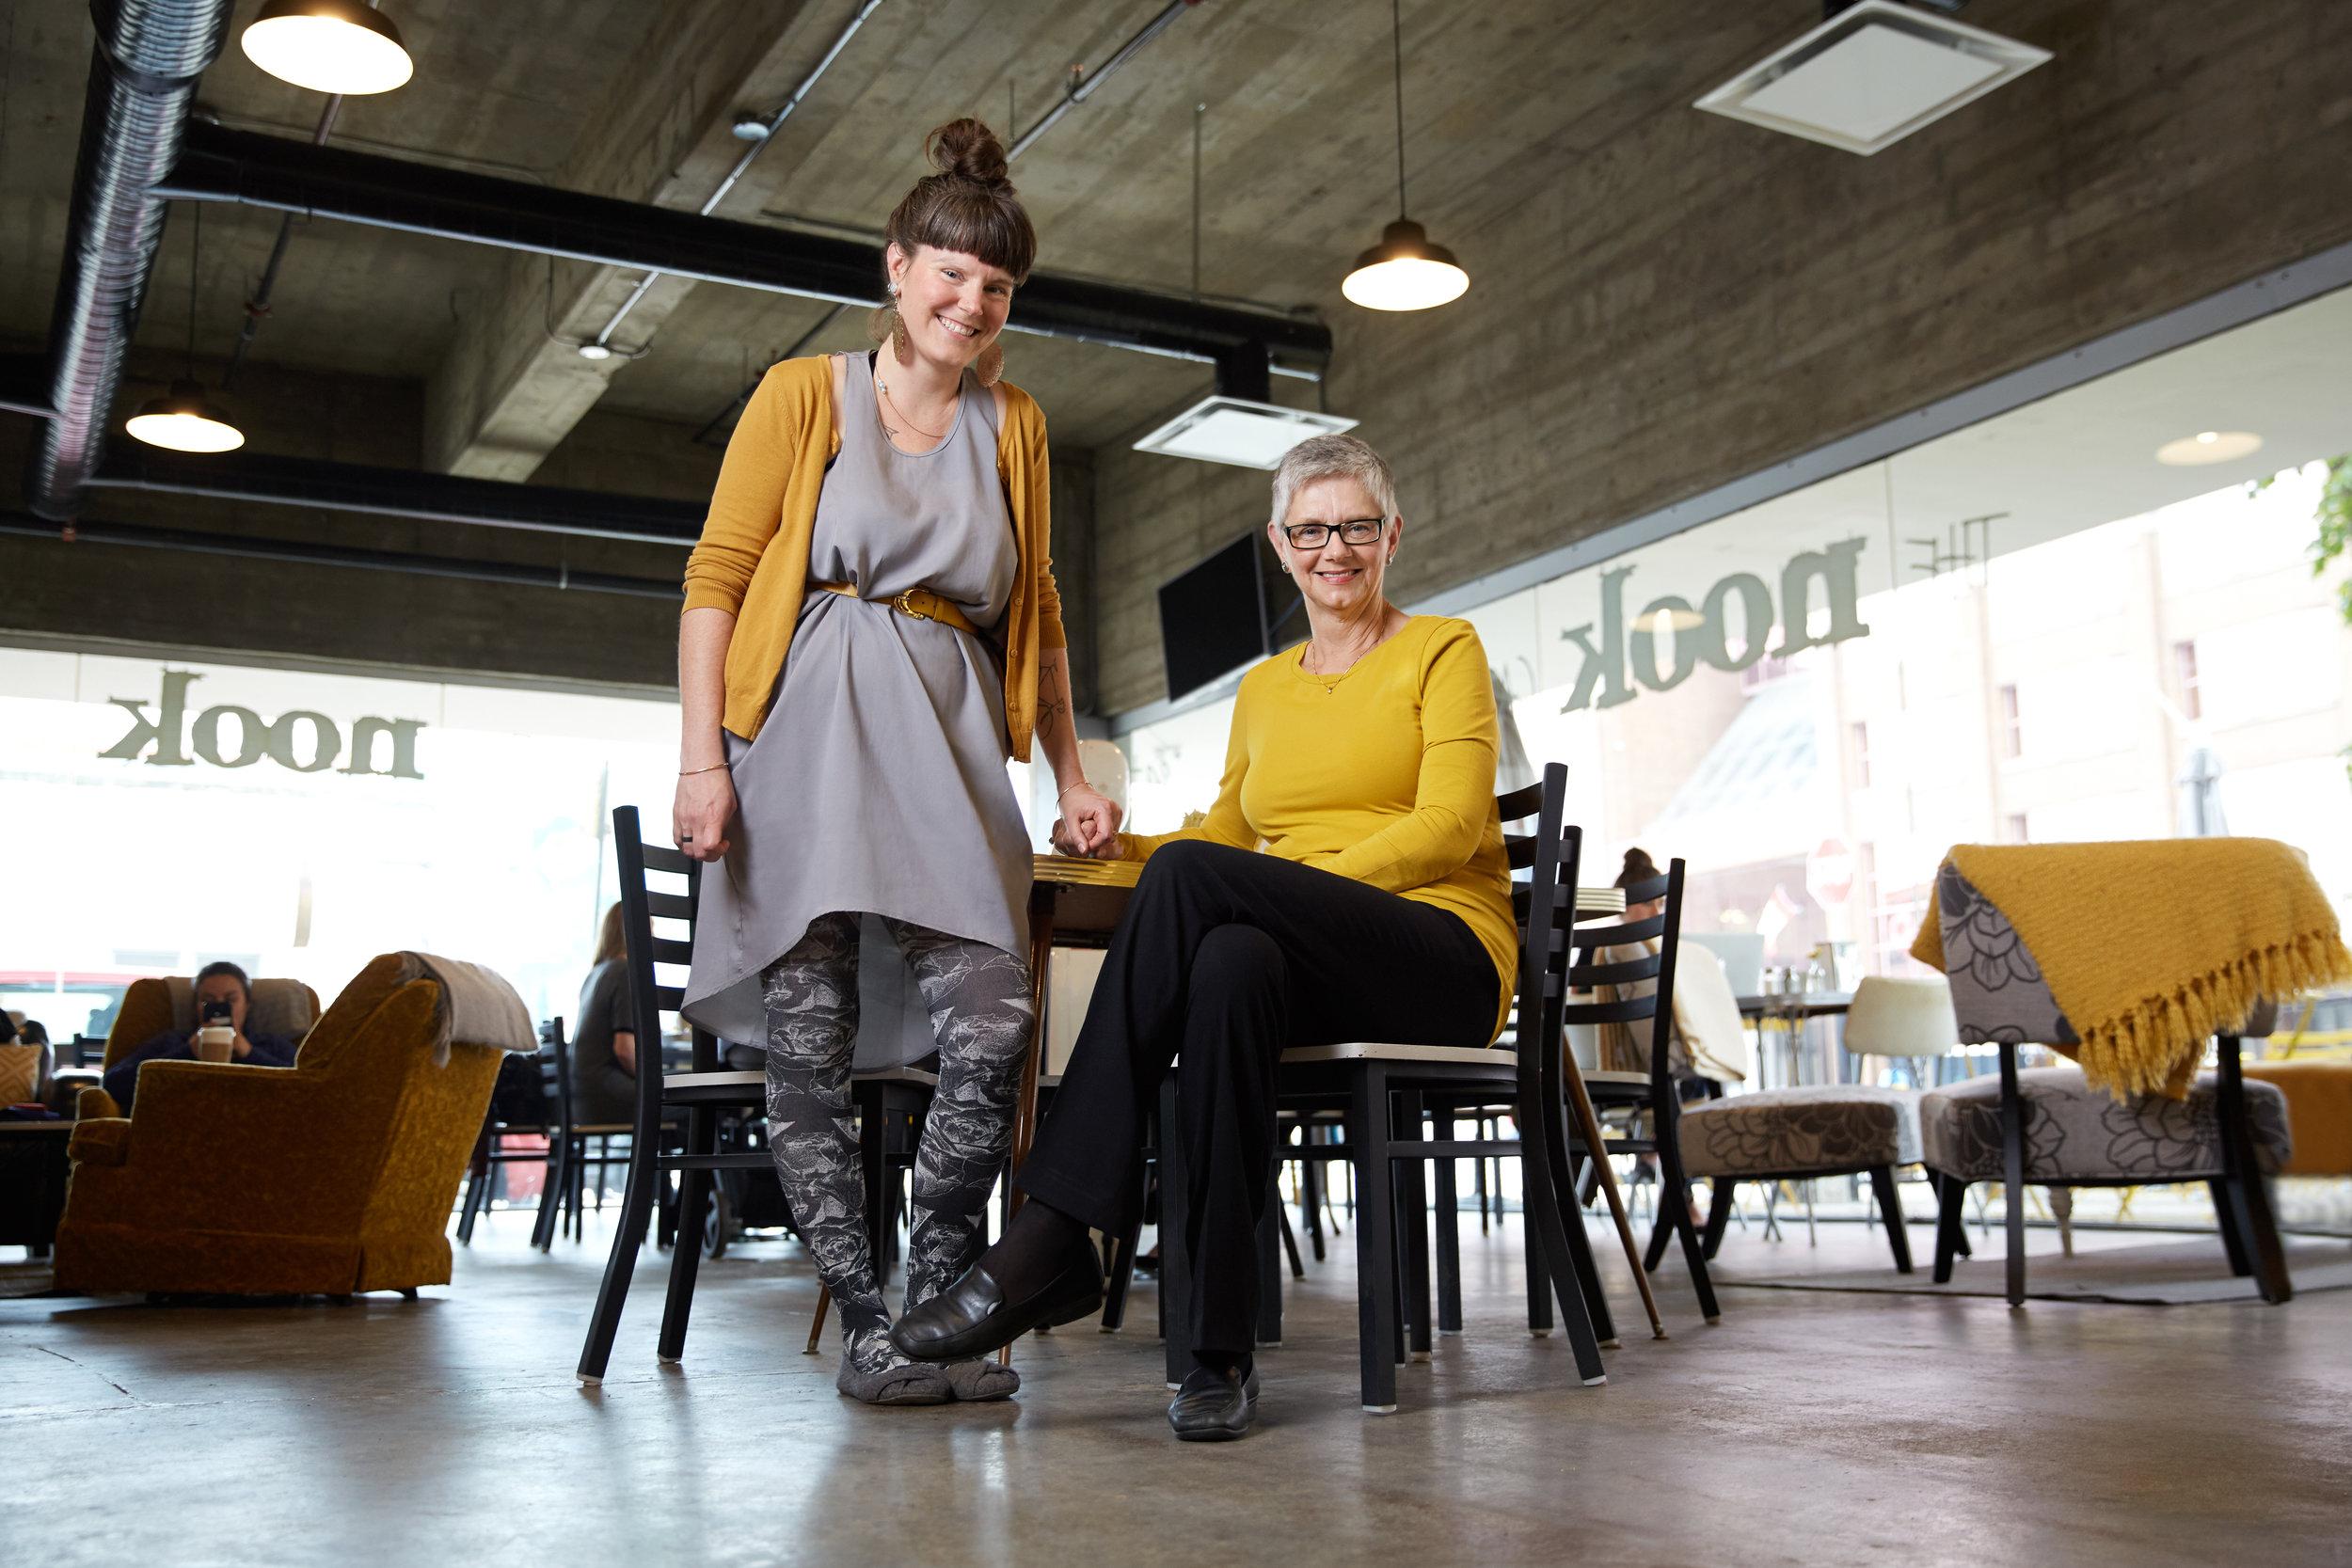 Marnie-Suitor-Lysae-Moon-Davies-Nook-Cafe-Tatawaw-Founding-Member-Ryan-Parker-Photography-Edmonton-Alberta.jpg